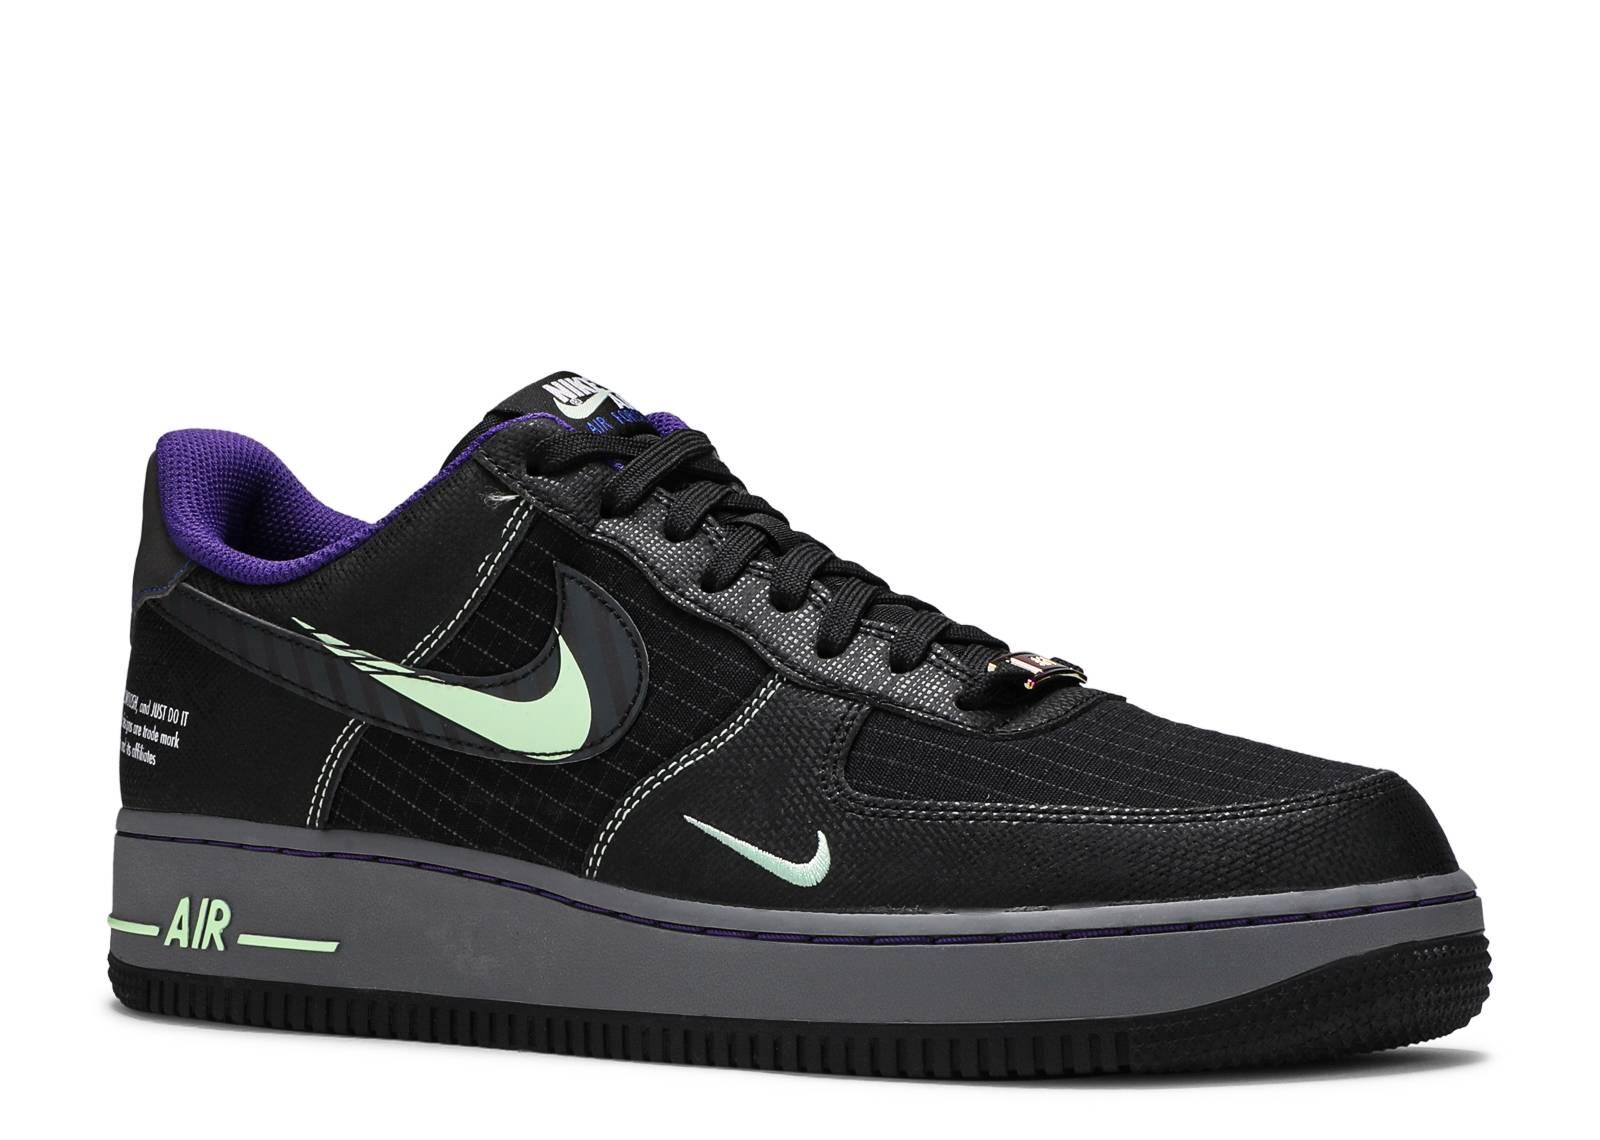 Nike Air Force 1 Trainers Black Dark Grey Racer Blue